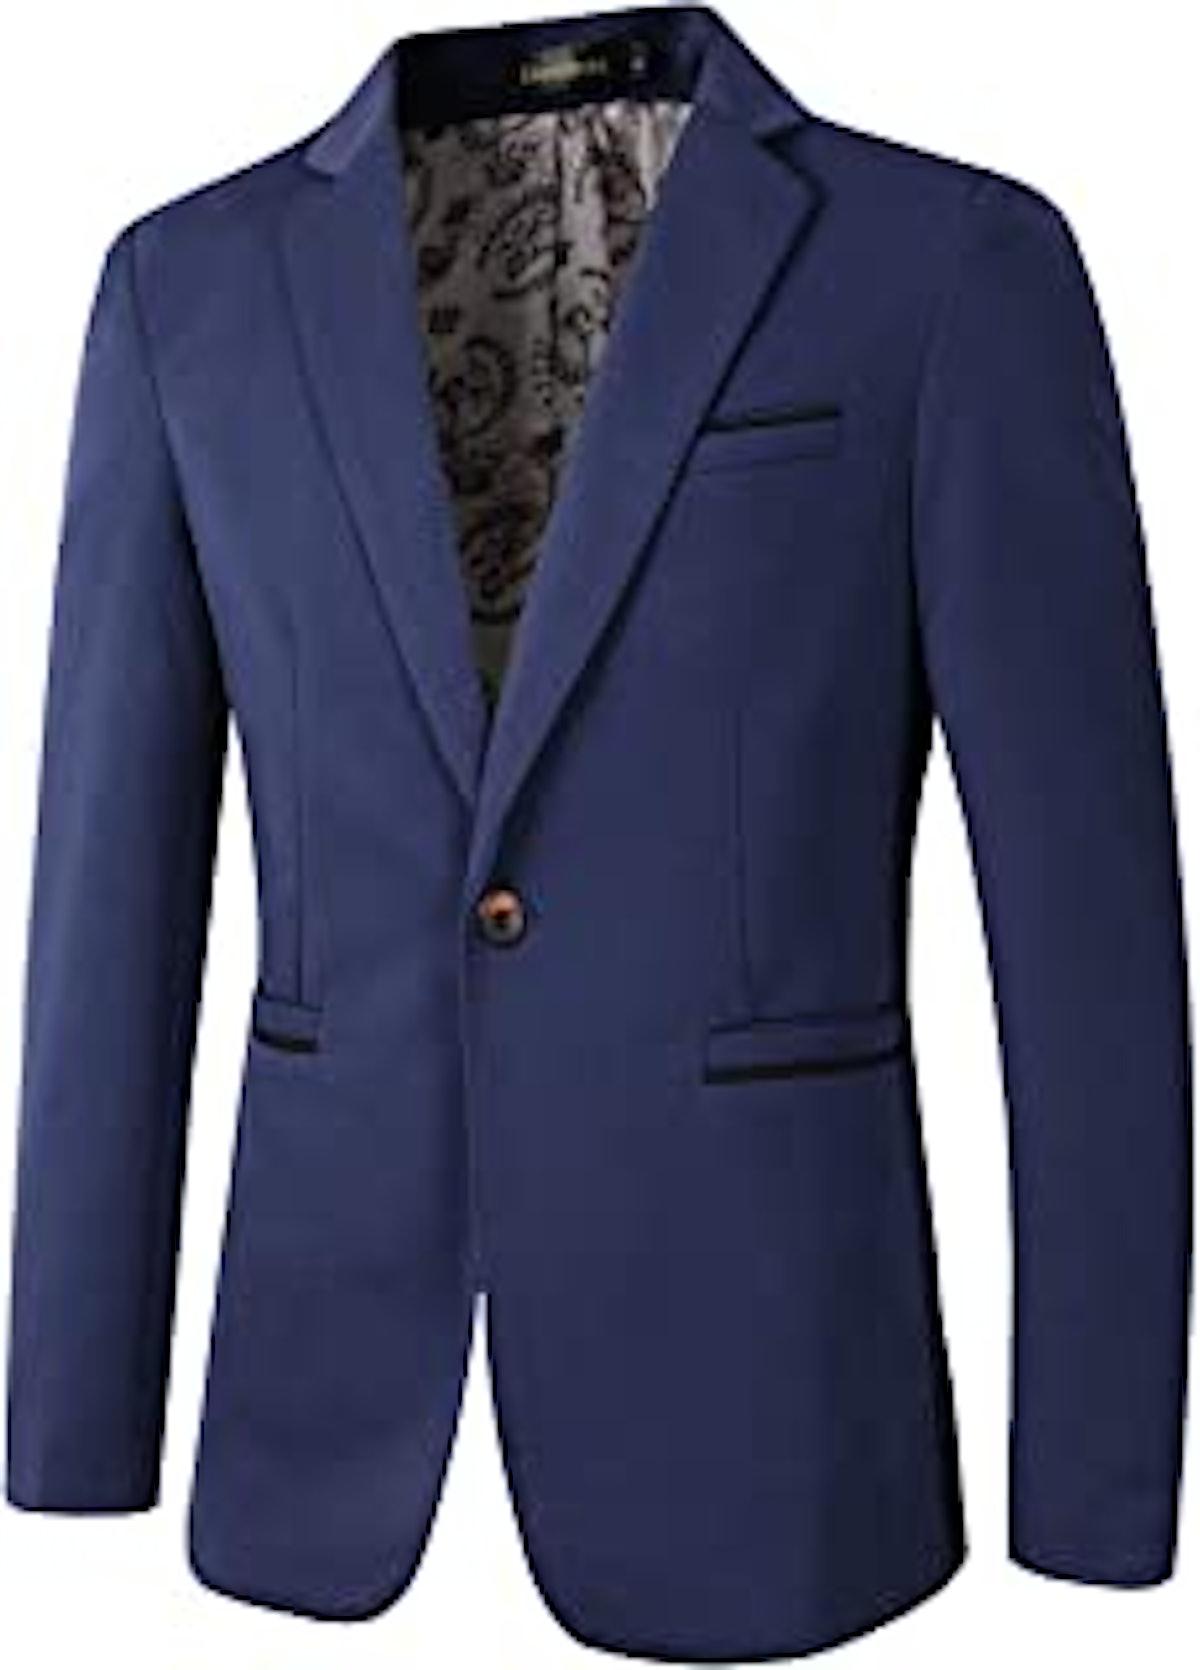 Beninos Slim Fit Blazer